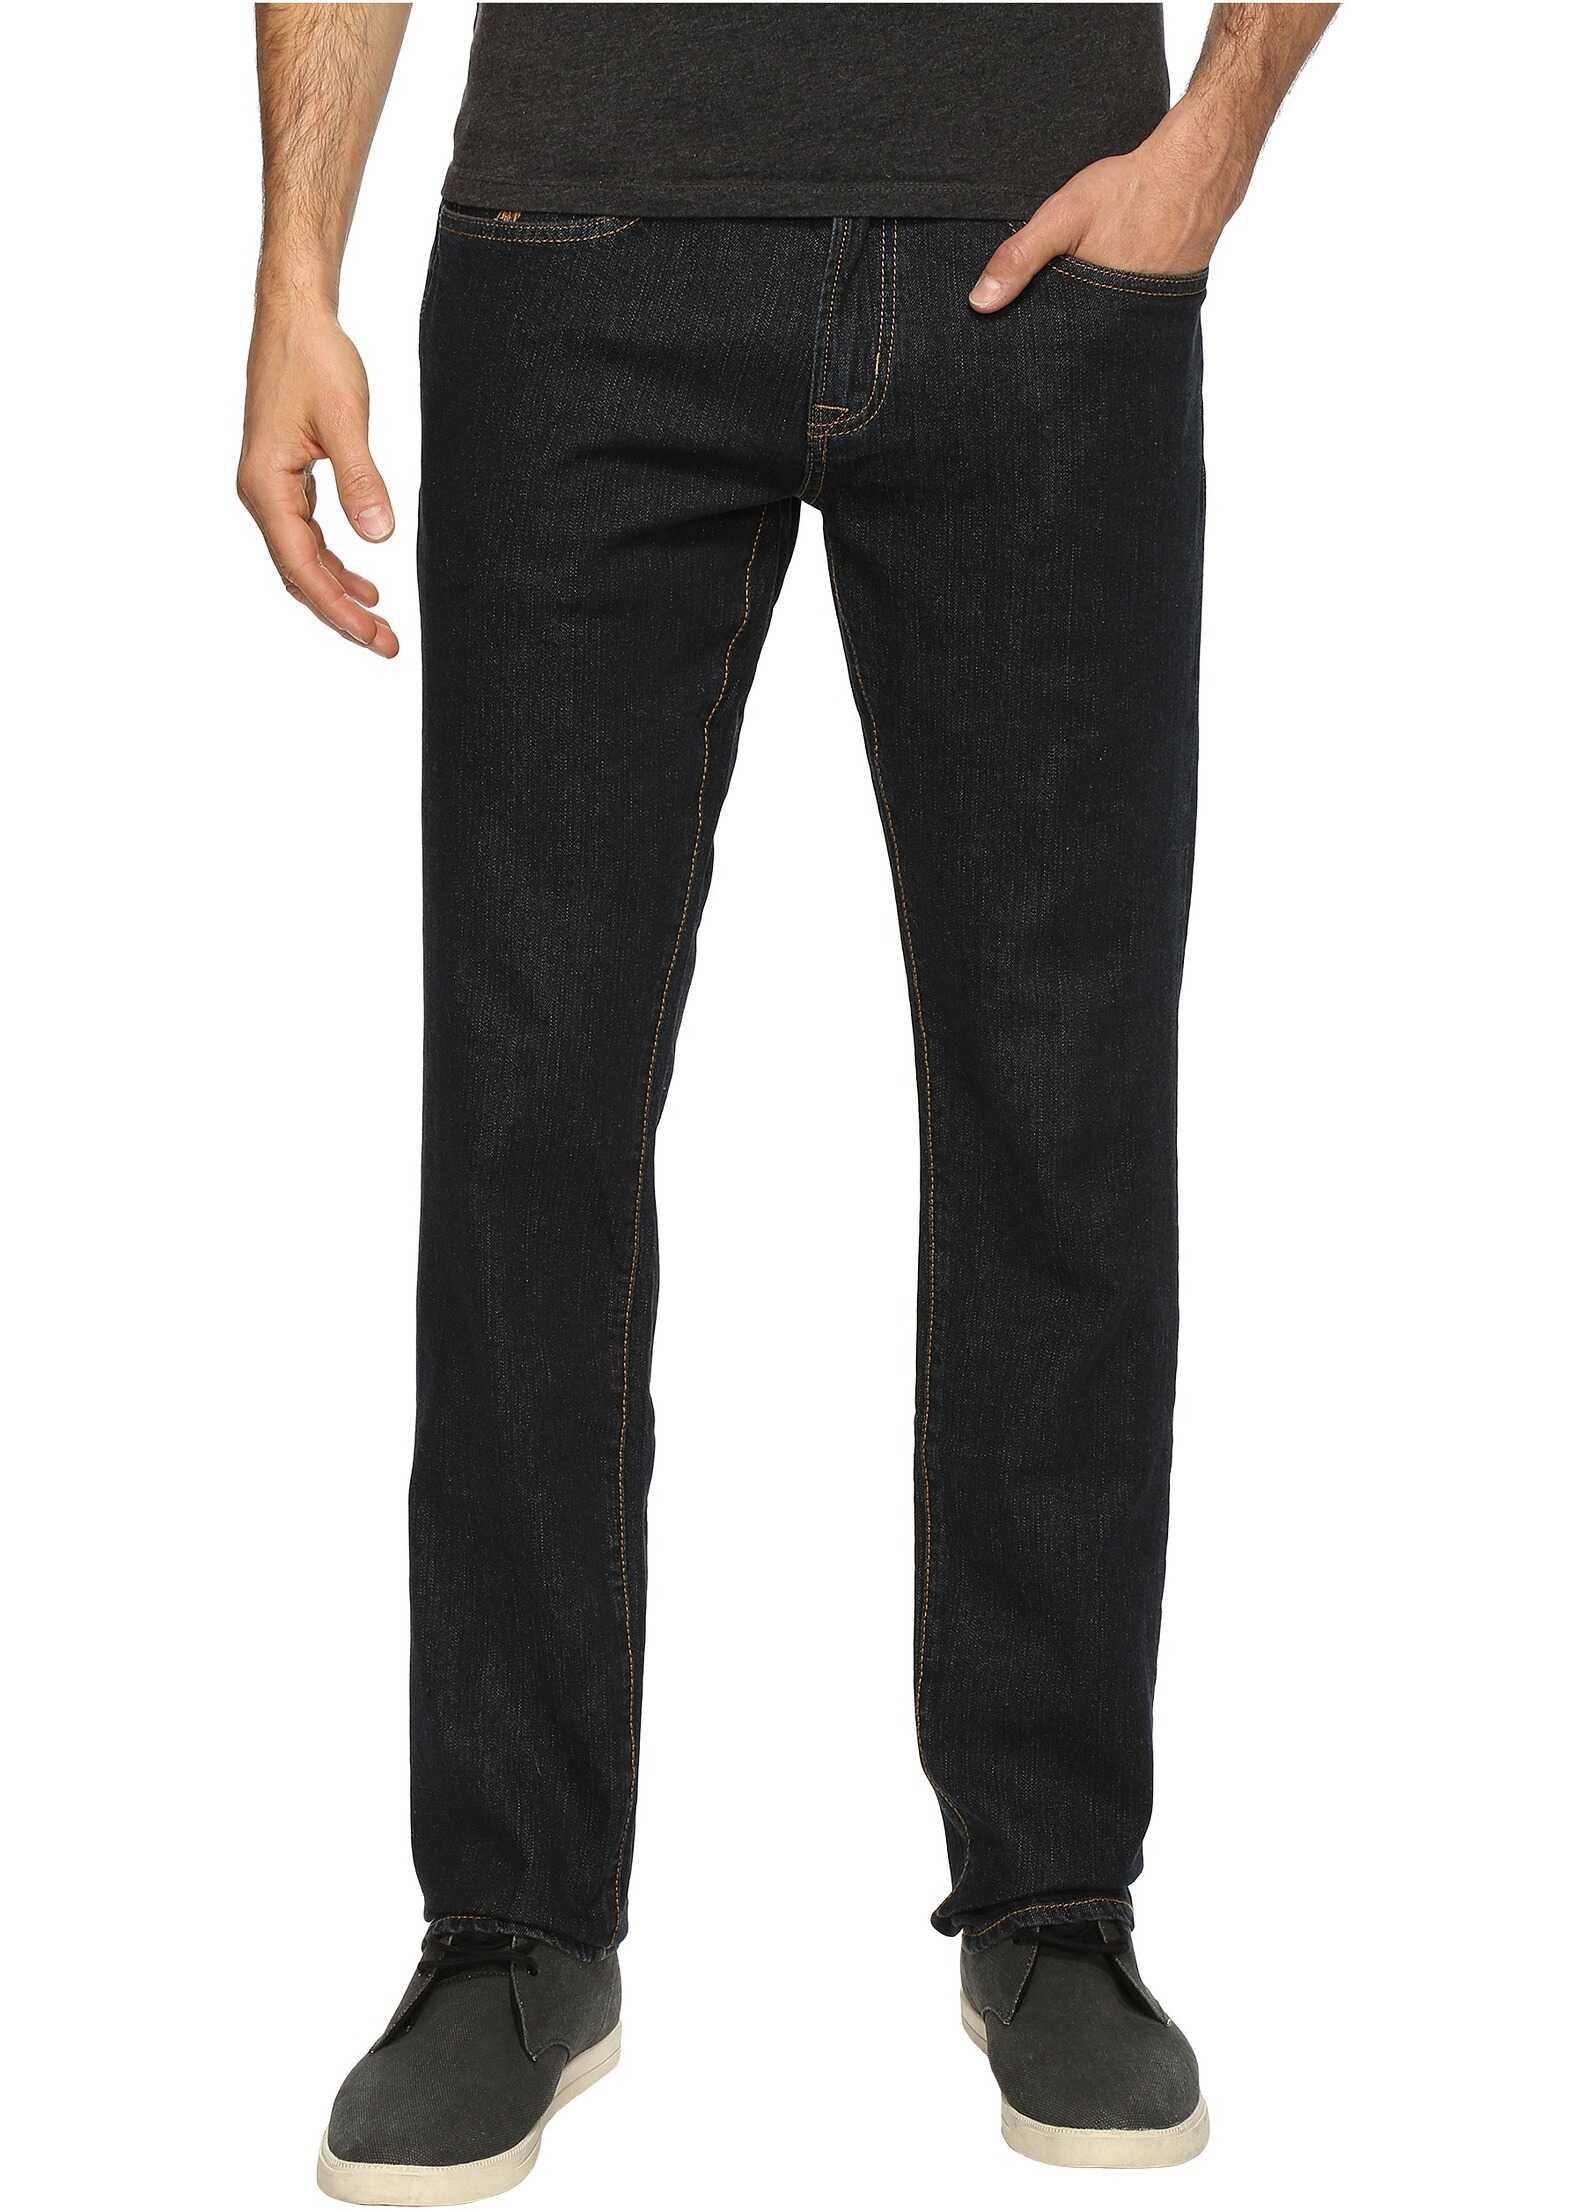 U.S. POLO ASSN. Slim Straight Stretch Denim Five-Pocket Jeans in Blue Blue